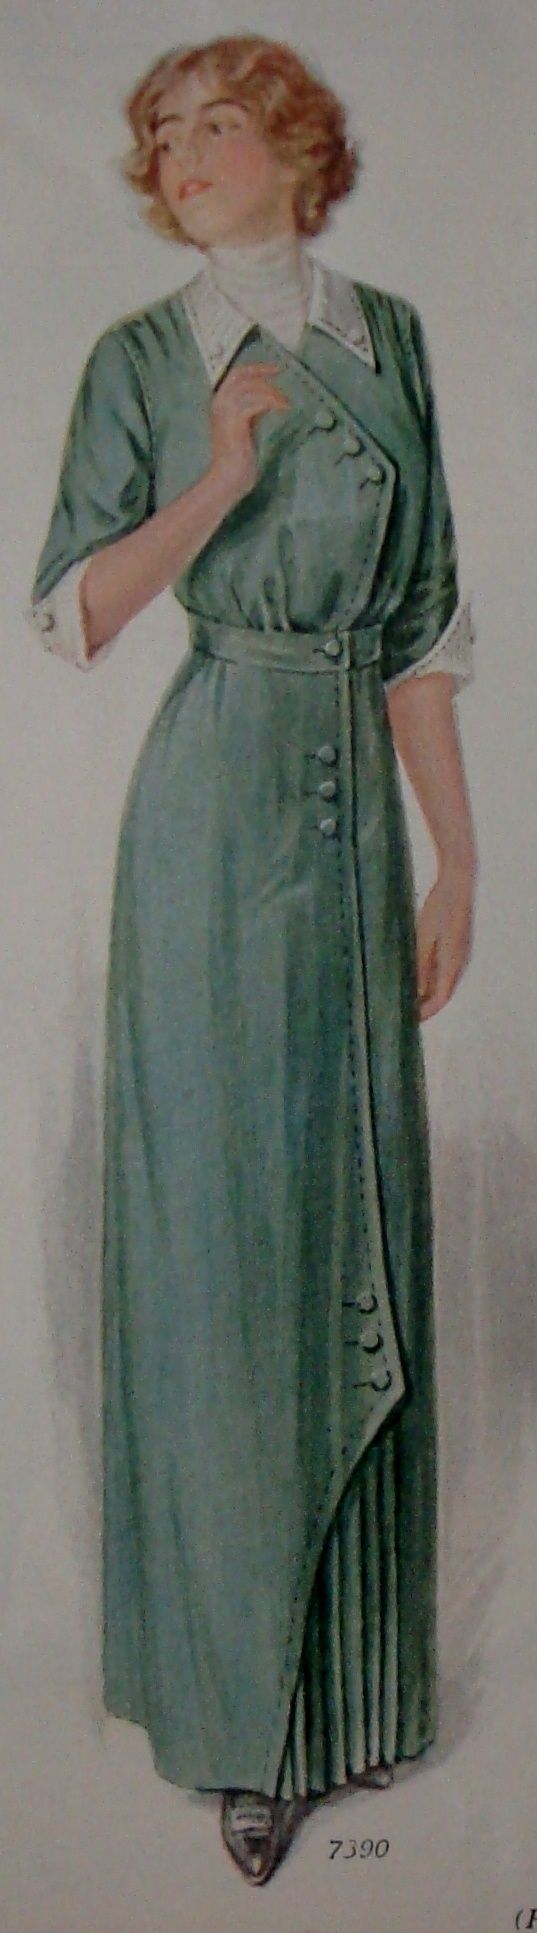 Fashion 1910 To 1920 - 1913 ladies home journal crossover bodice button trim pretty green